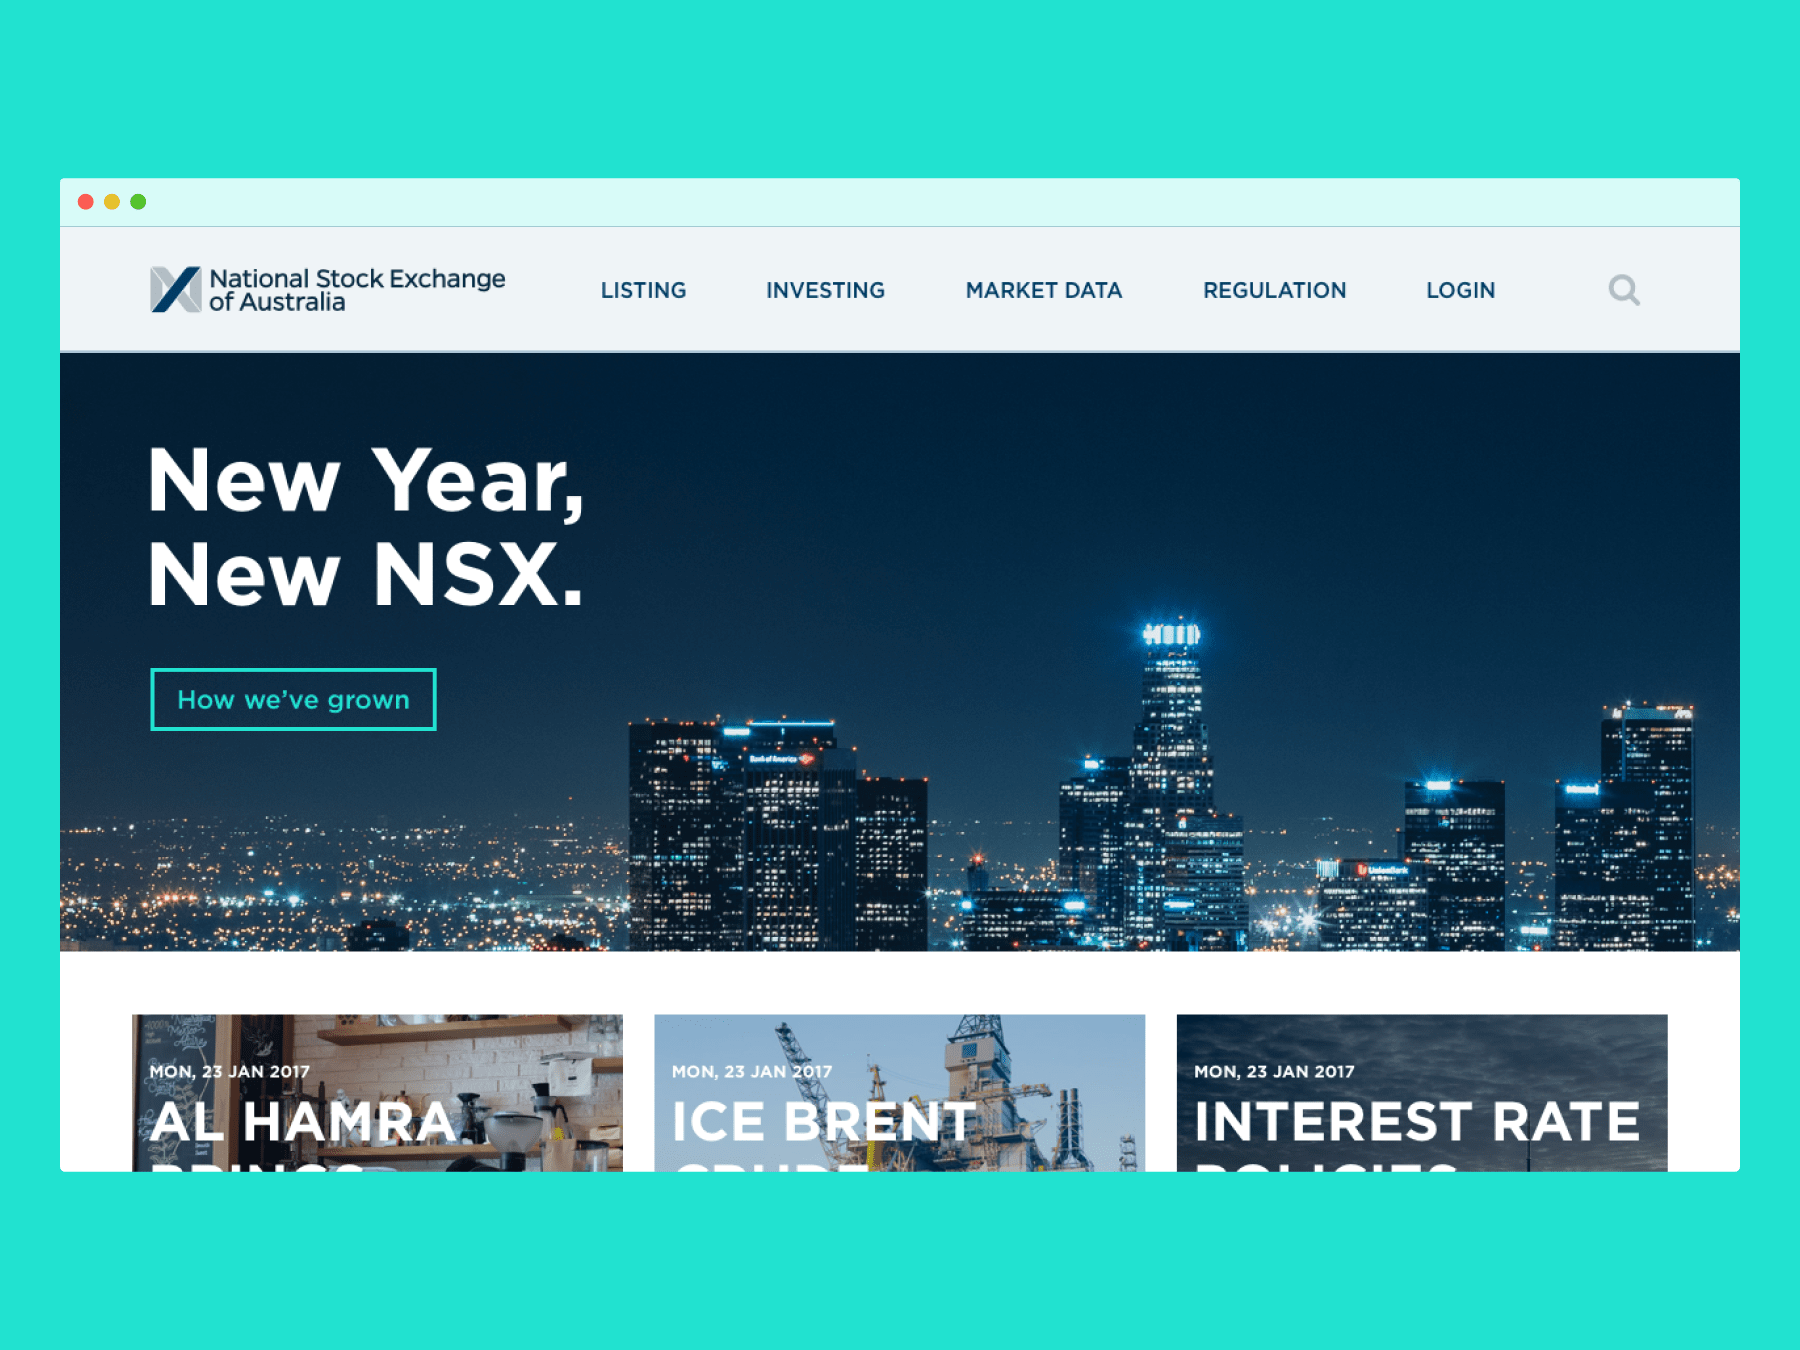 The National Stock Exchange of Australia